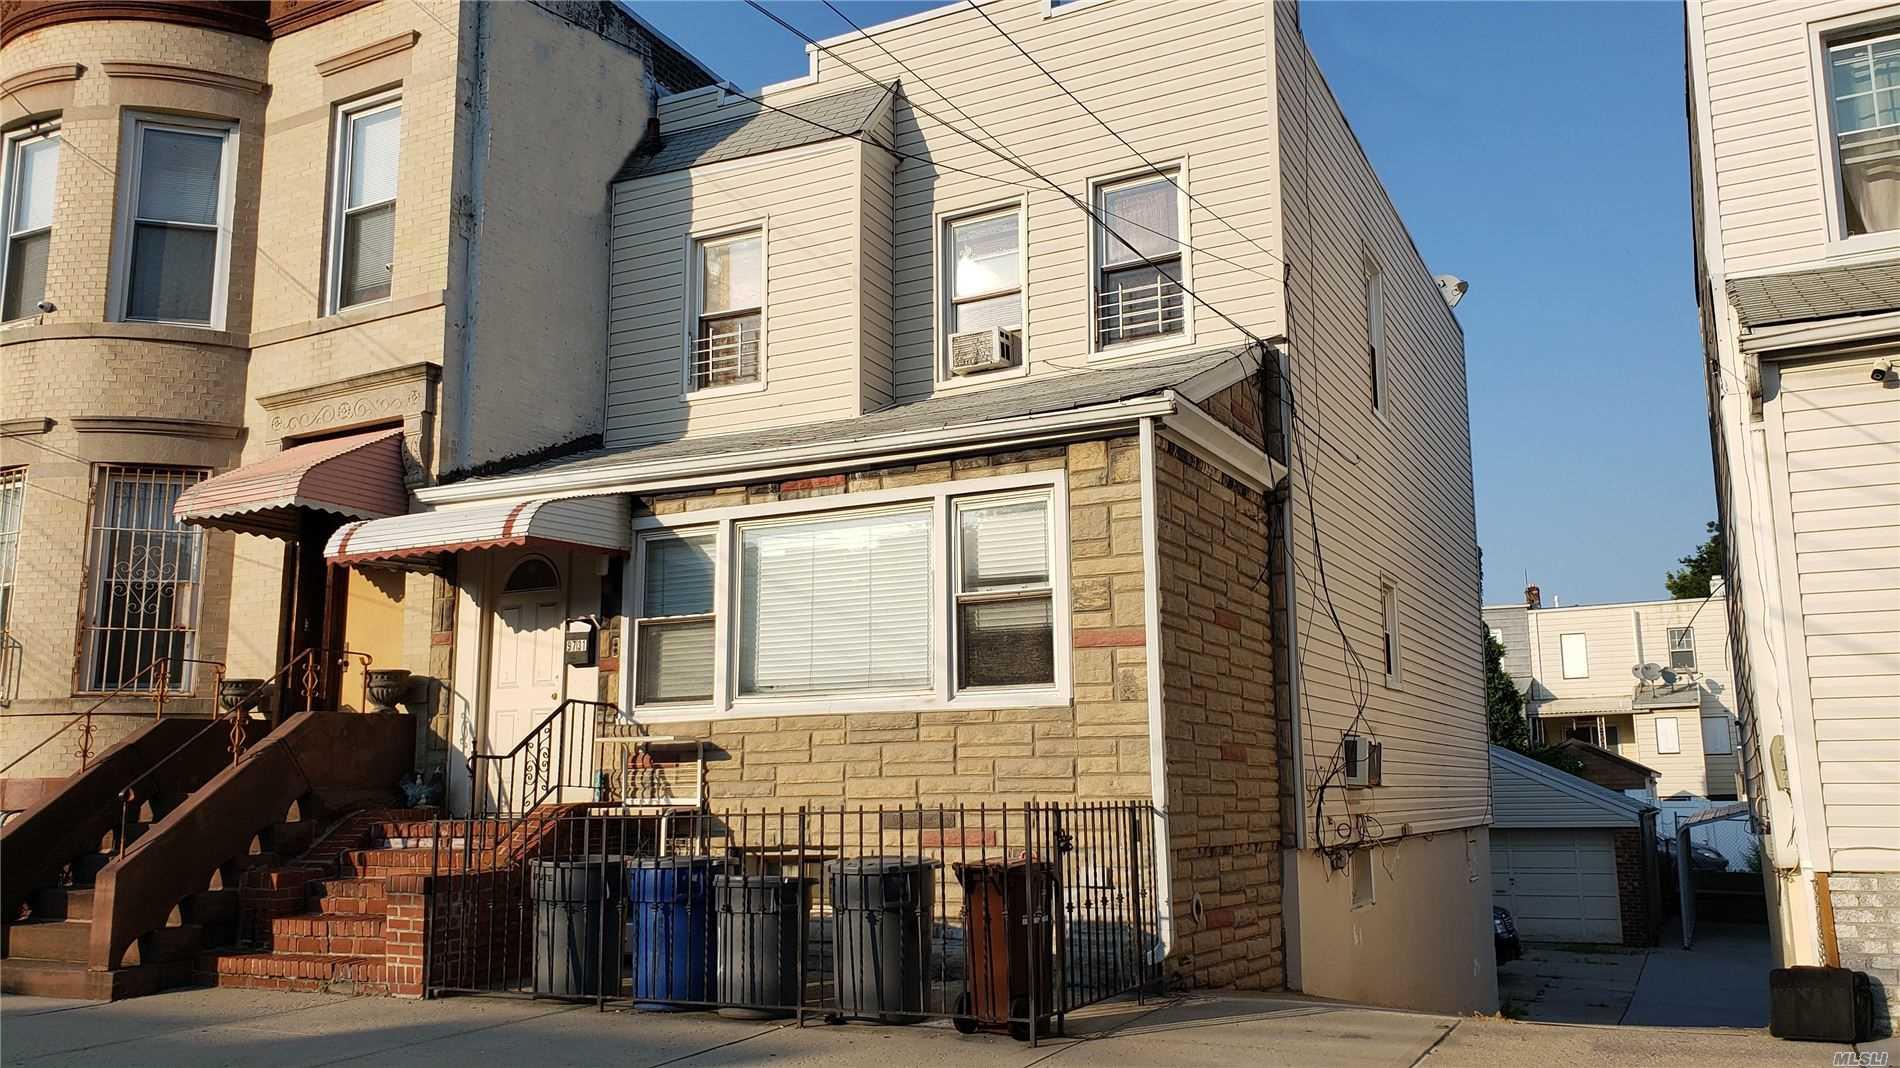 Property for sale at 97-31 80 Street, Ozone Park NY 11416, Ozone Park,  New York 11416